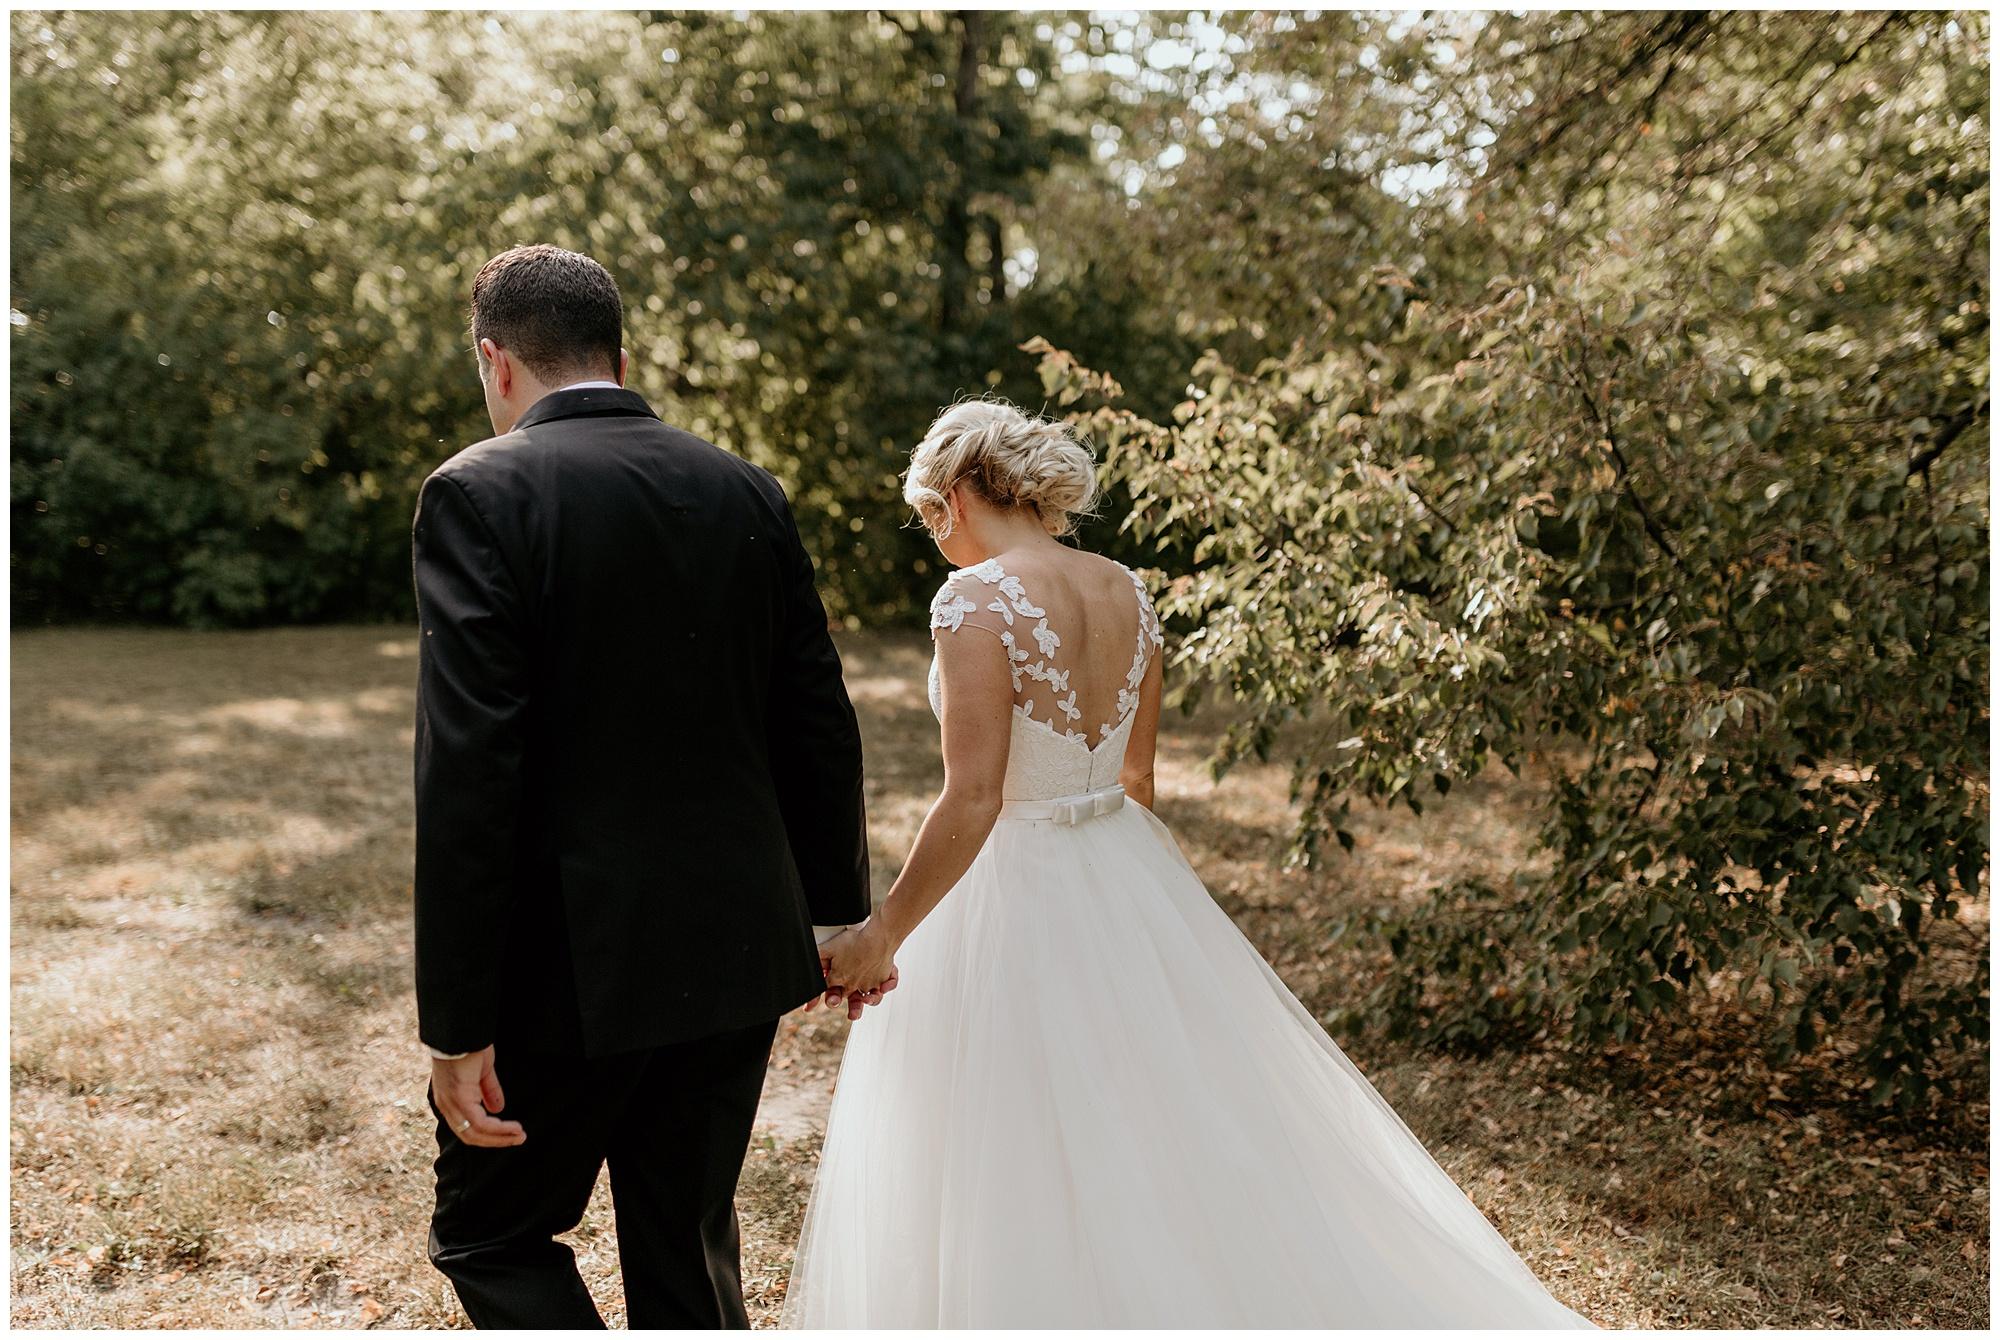 pear_tree_estate_wedding_champaign_il_wright_photographs_jj_0091.jpg